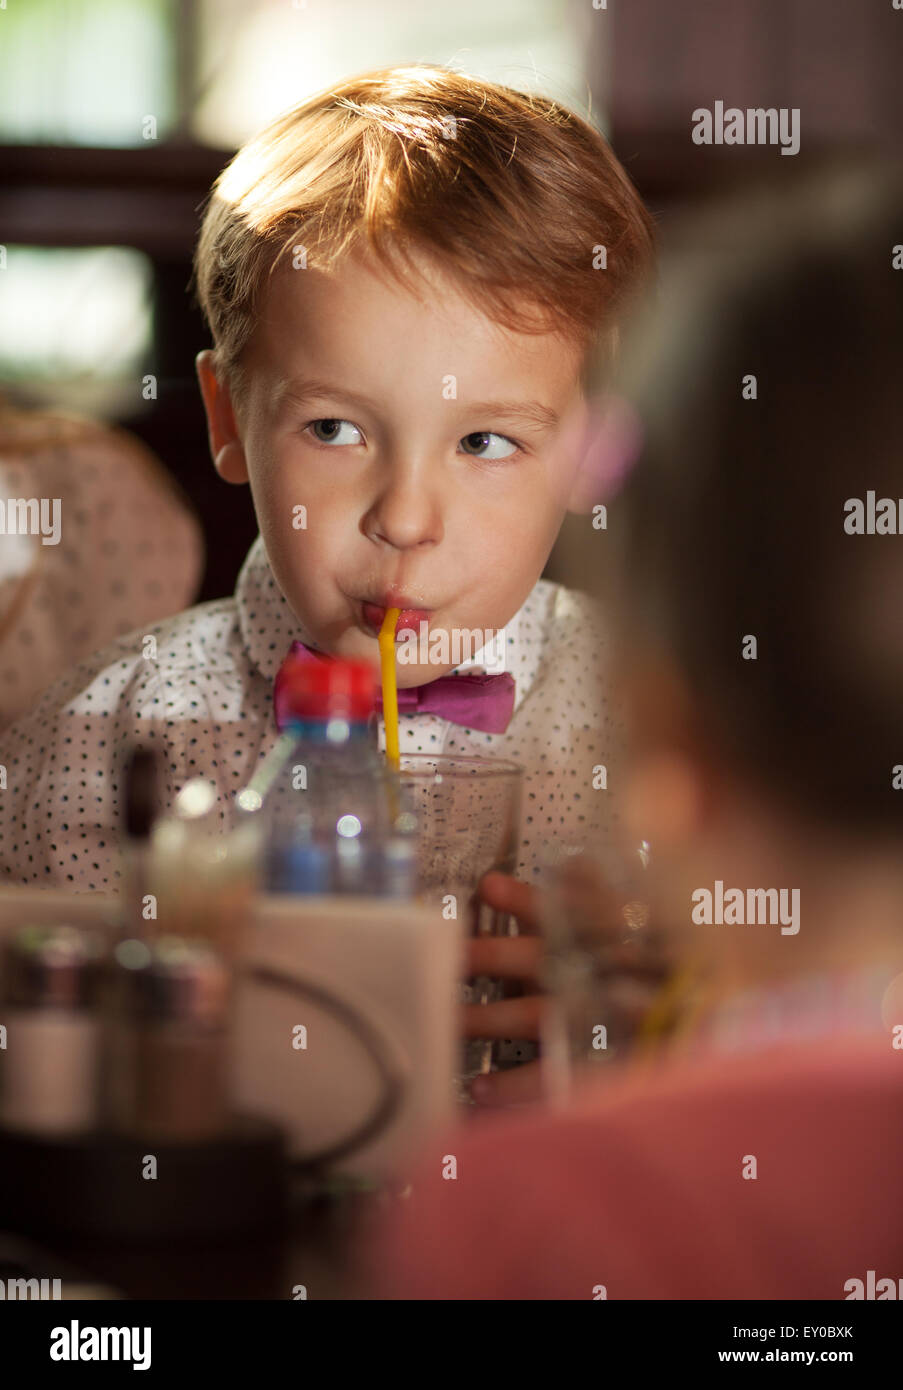 Little Boy bebiendo con hojaldre Imagen De Stock